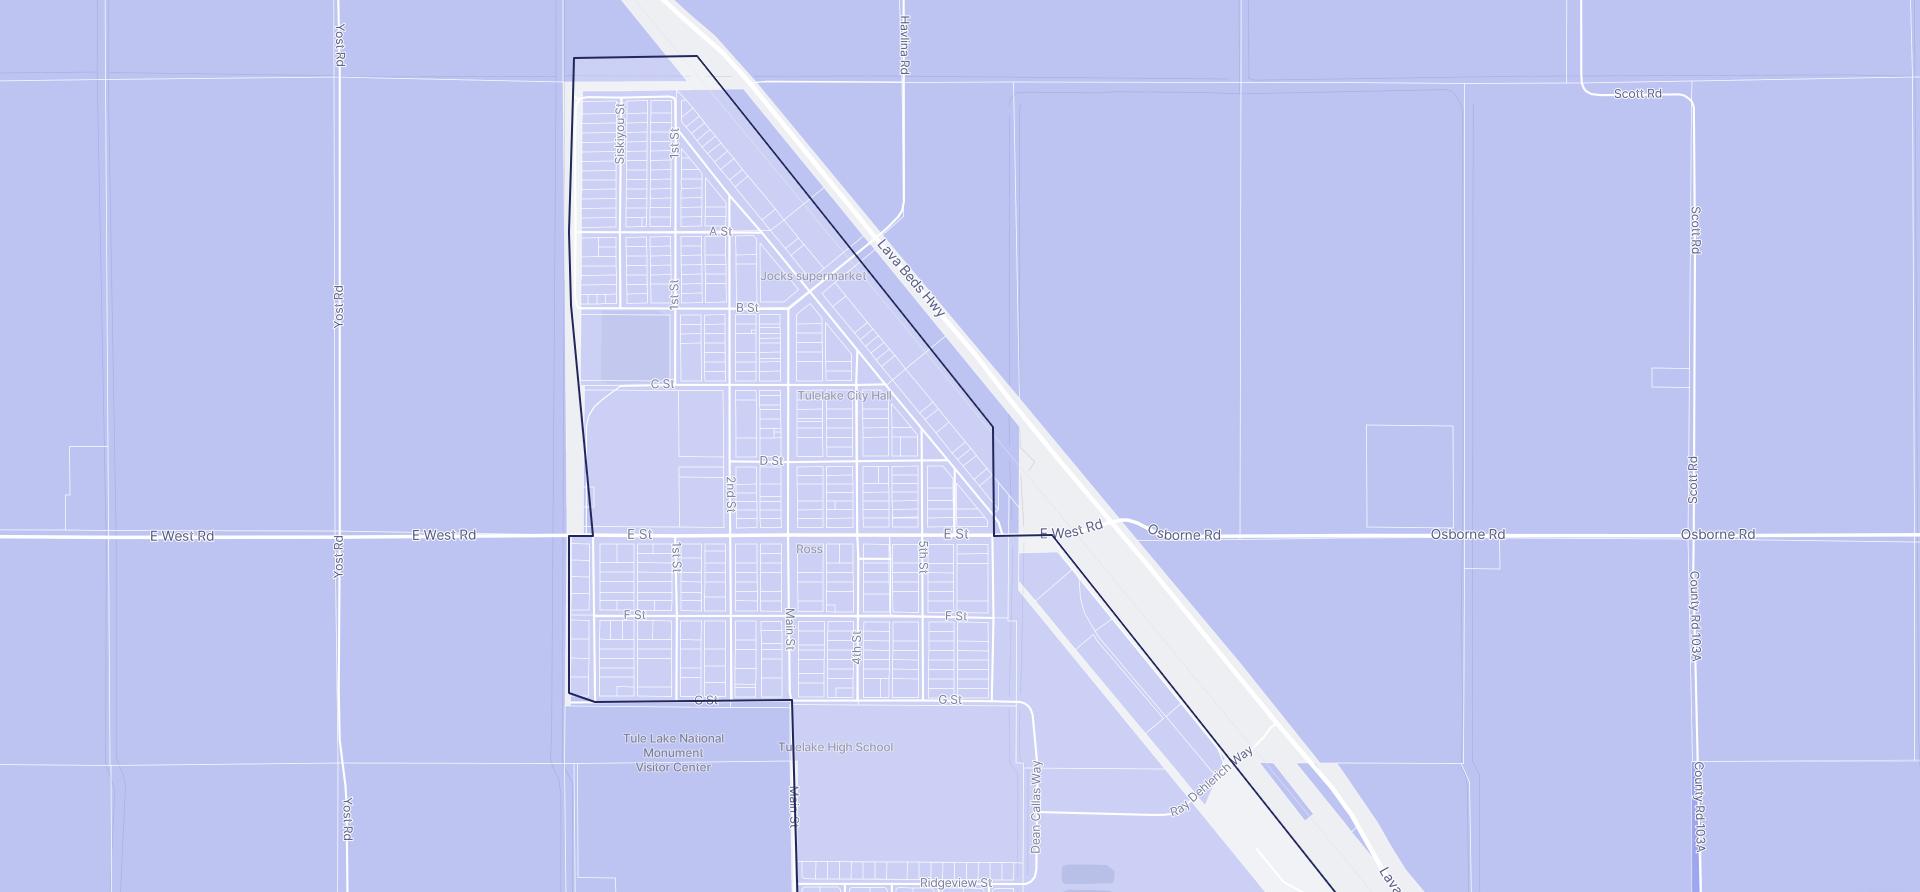 Image of Tulelake boundaries on a map.